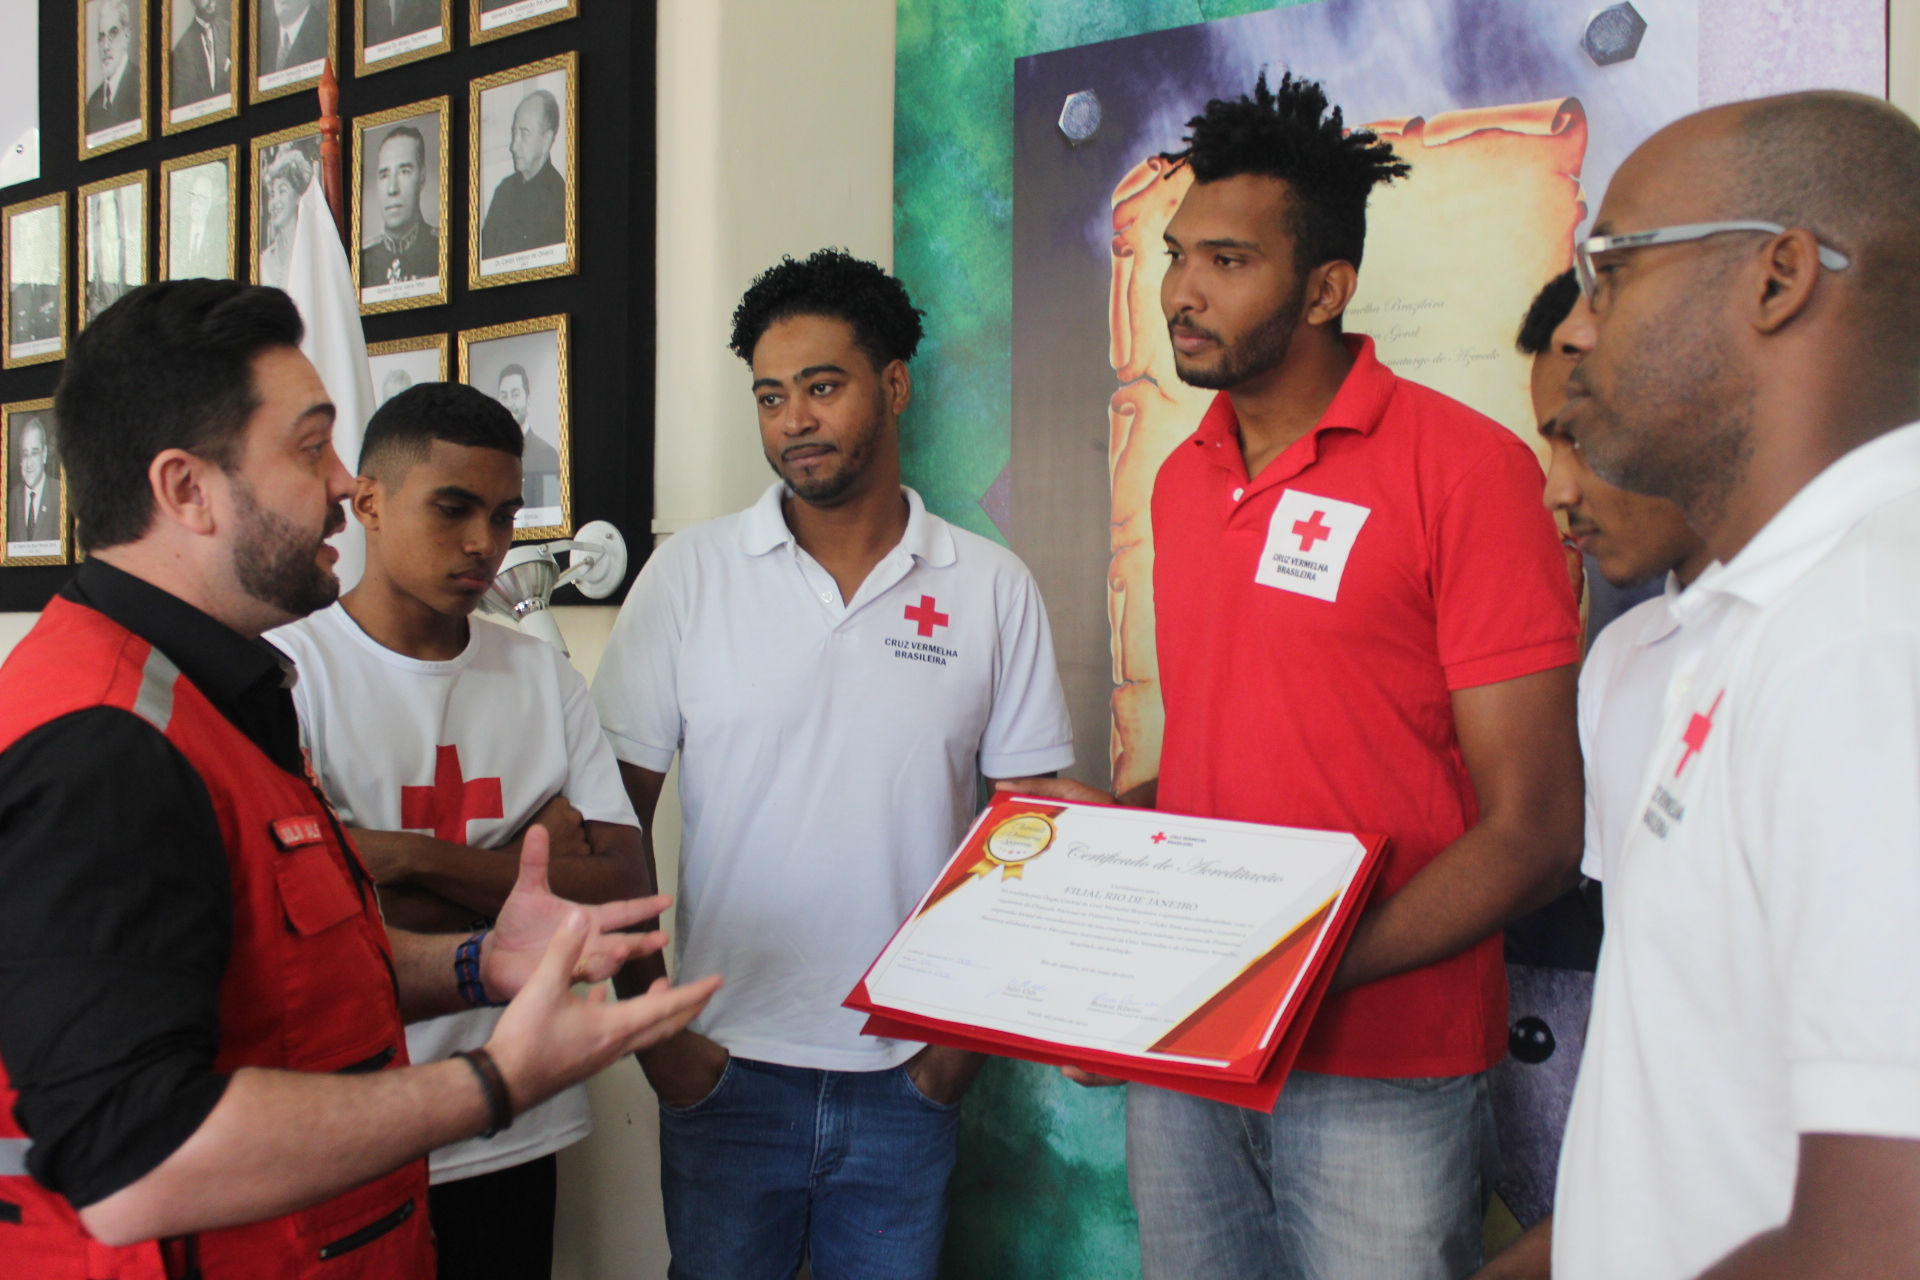 Entrega da Chancela de Primeiros Socorros a Filial do Rio de Janeiro 25.05 (35)